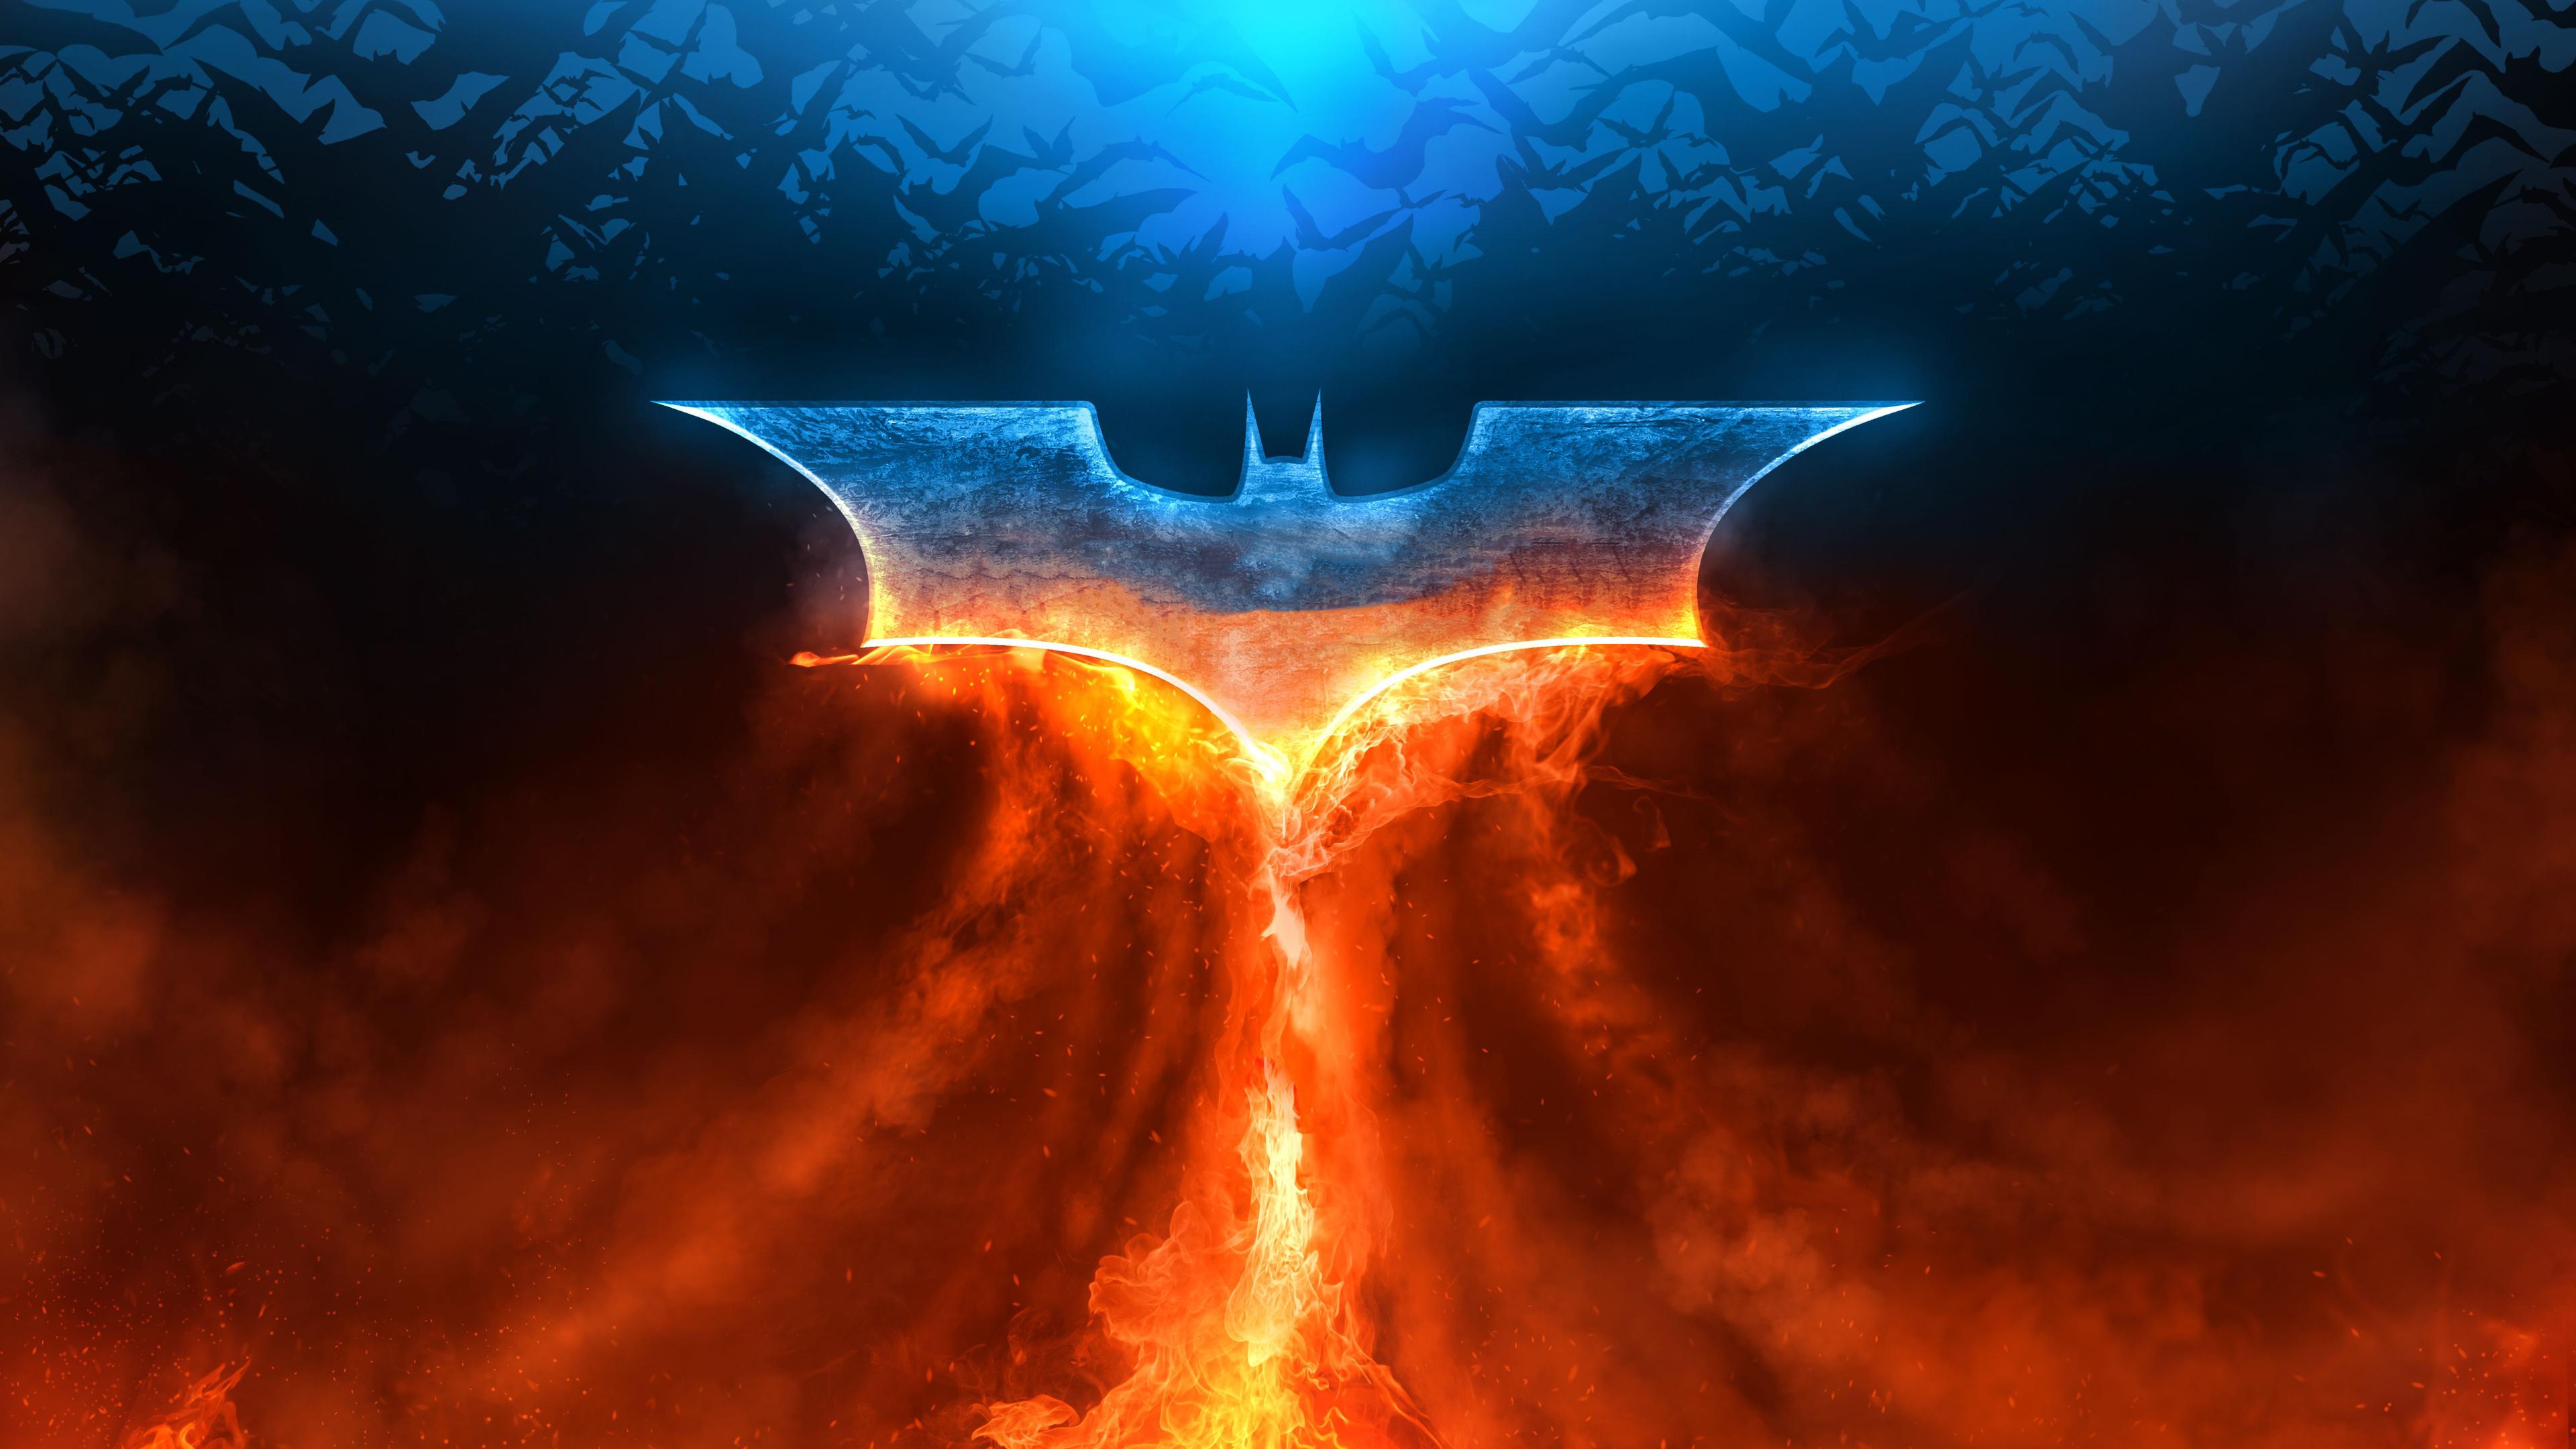 batman fire rise logo 4k 1546276343 - Batman Fire Rise Logo 4k - superheroes wallpapers, logo wallpapers, hd-wallpapers, batman wallpapers, 5k wallpapers, 4k-wallpapers